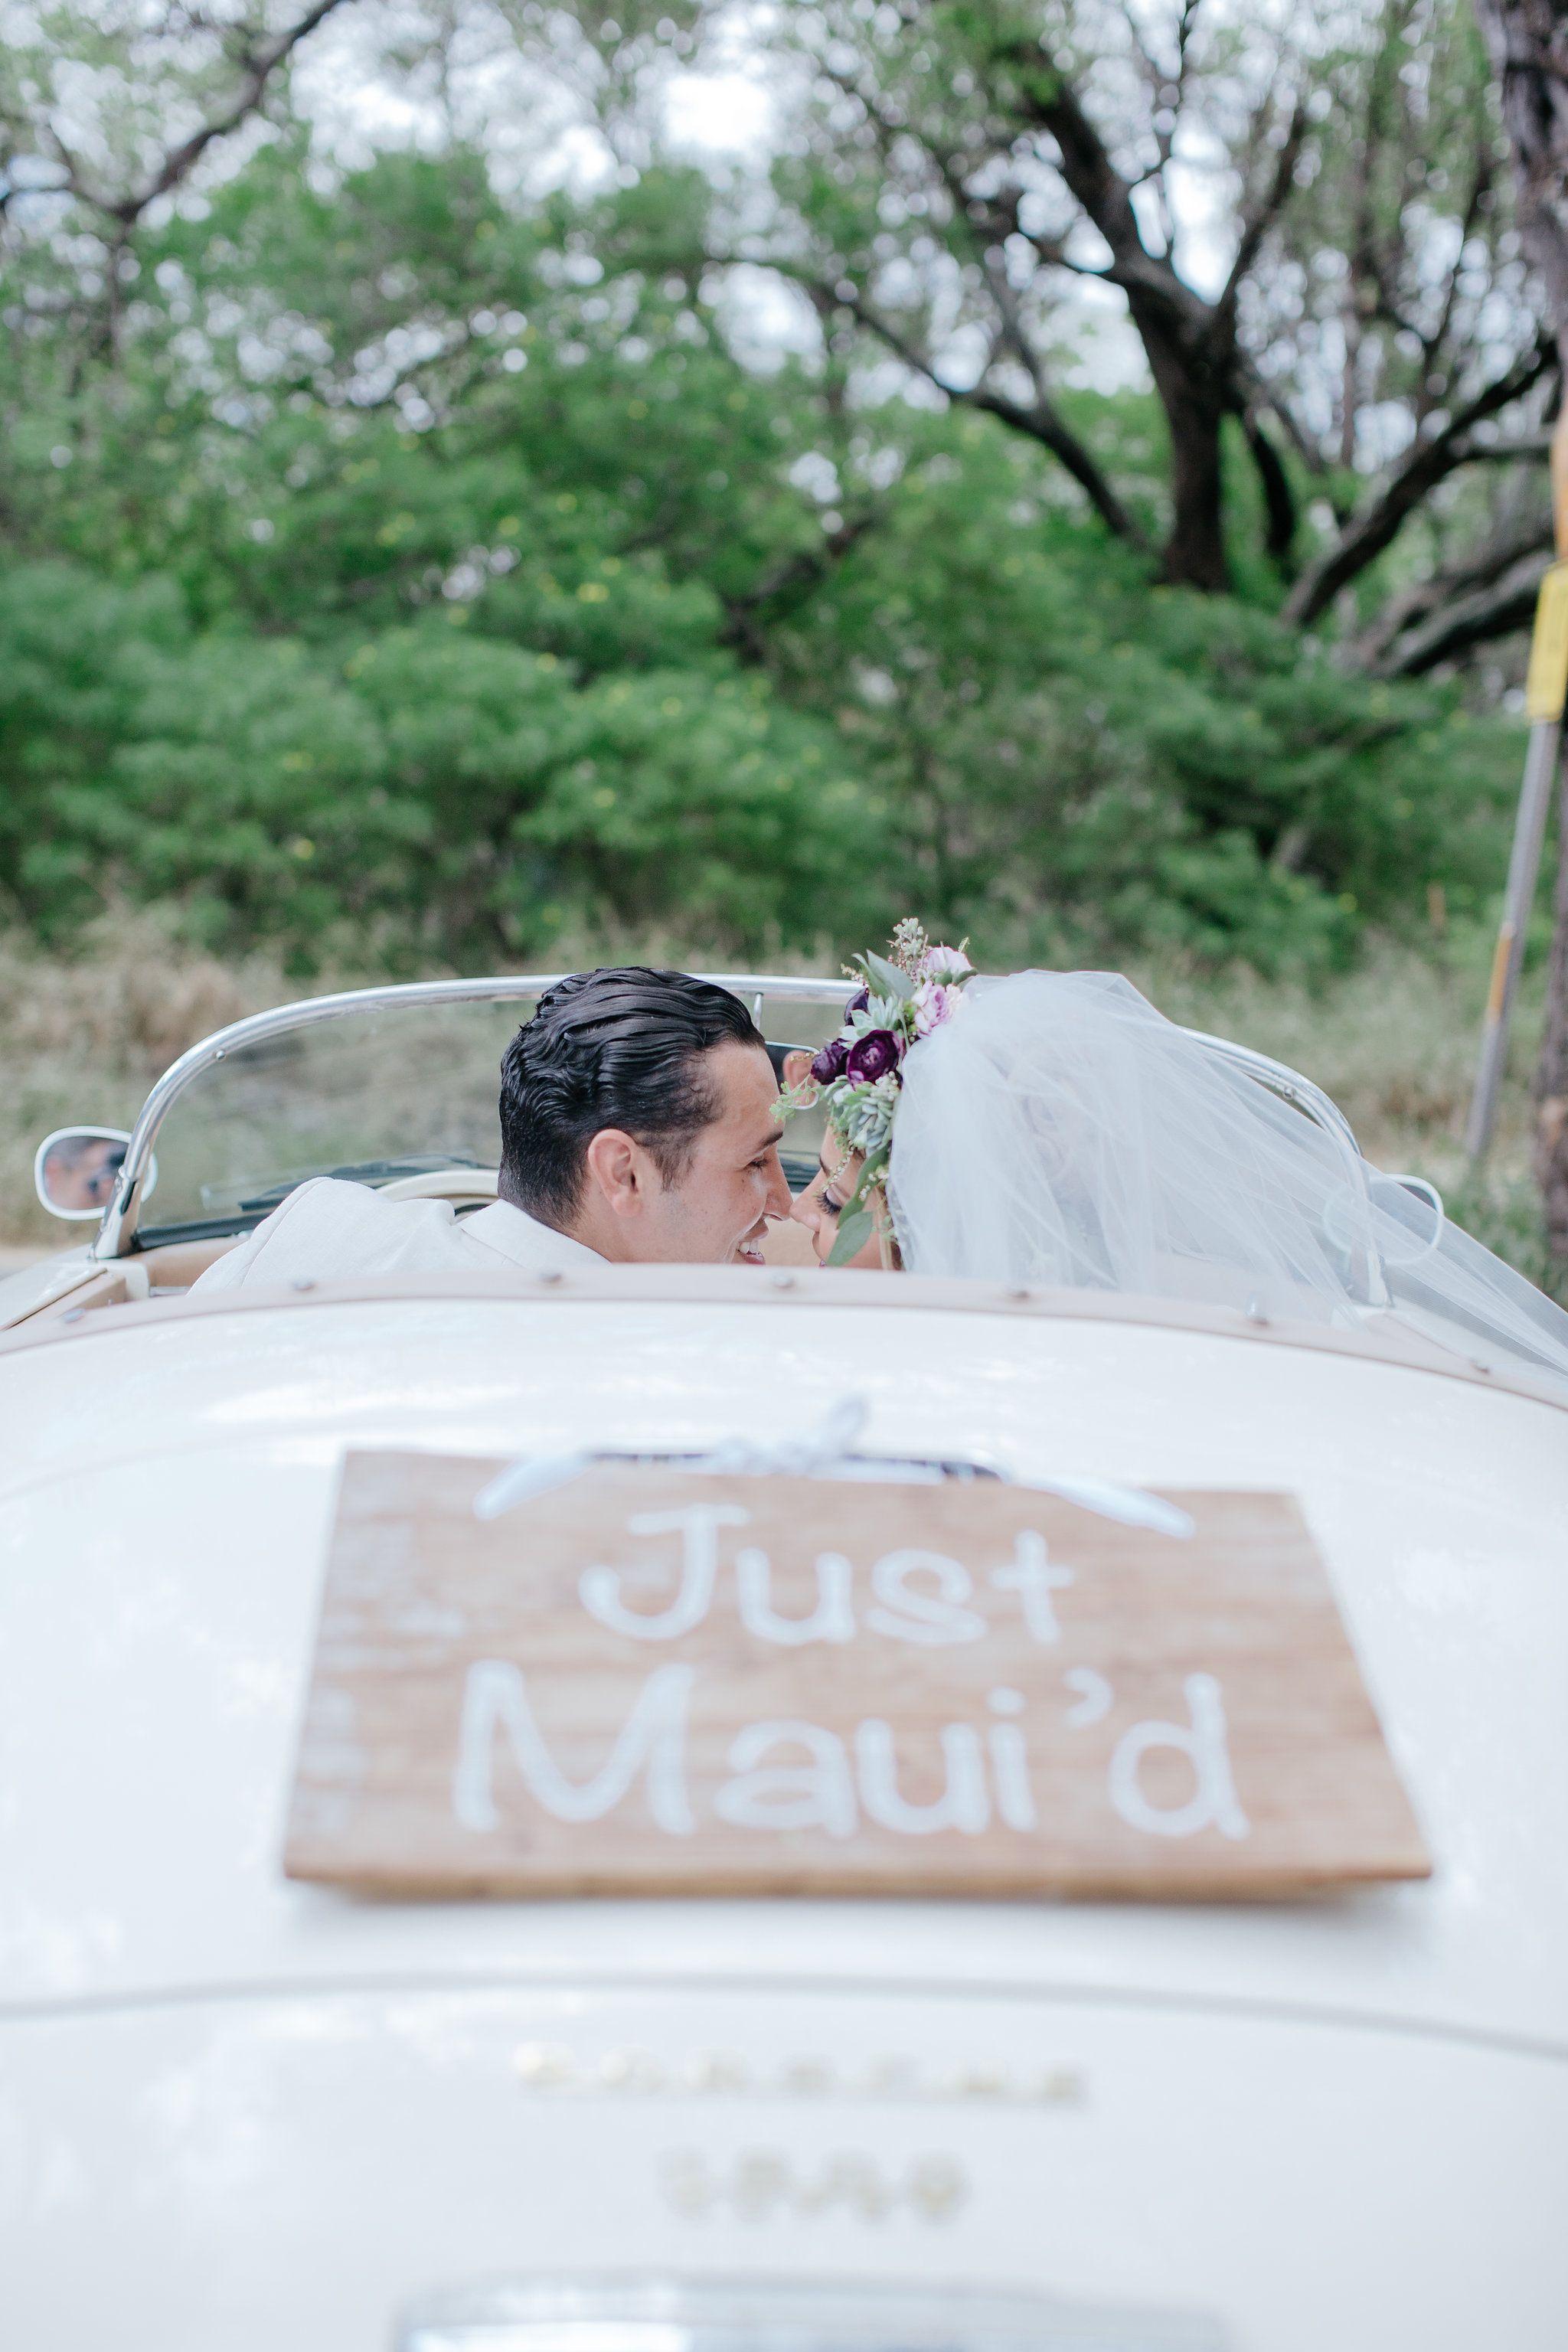 Wedding beach house  Hoda u Tarek said their ucI Dousud in a private and intimate wedding